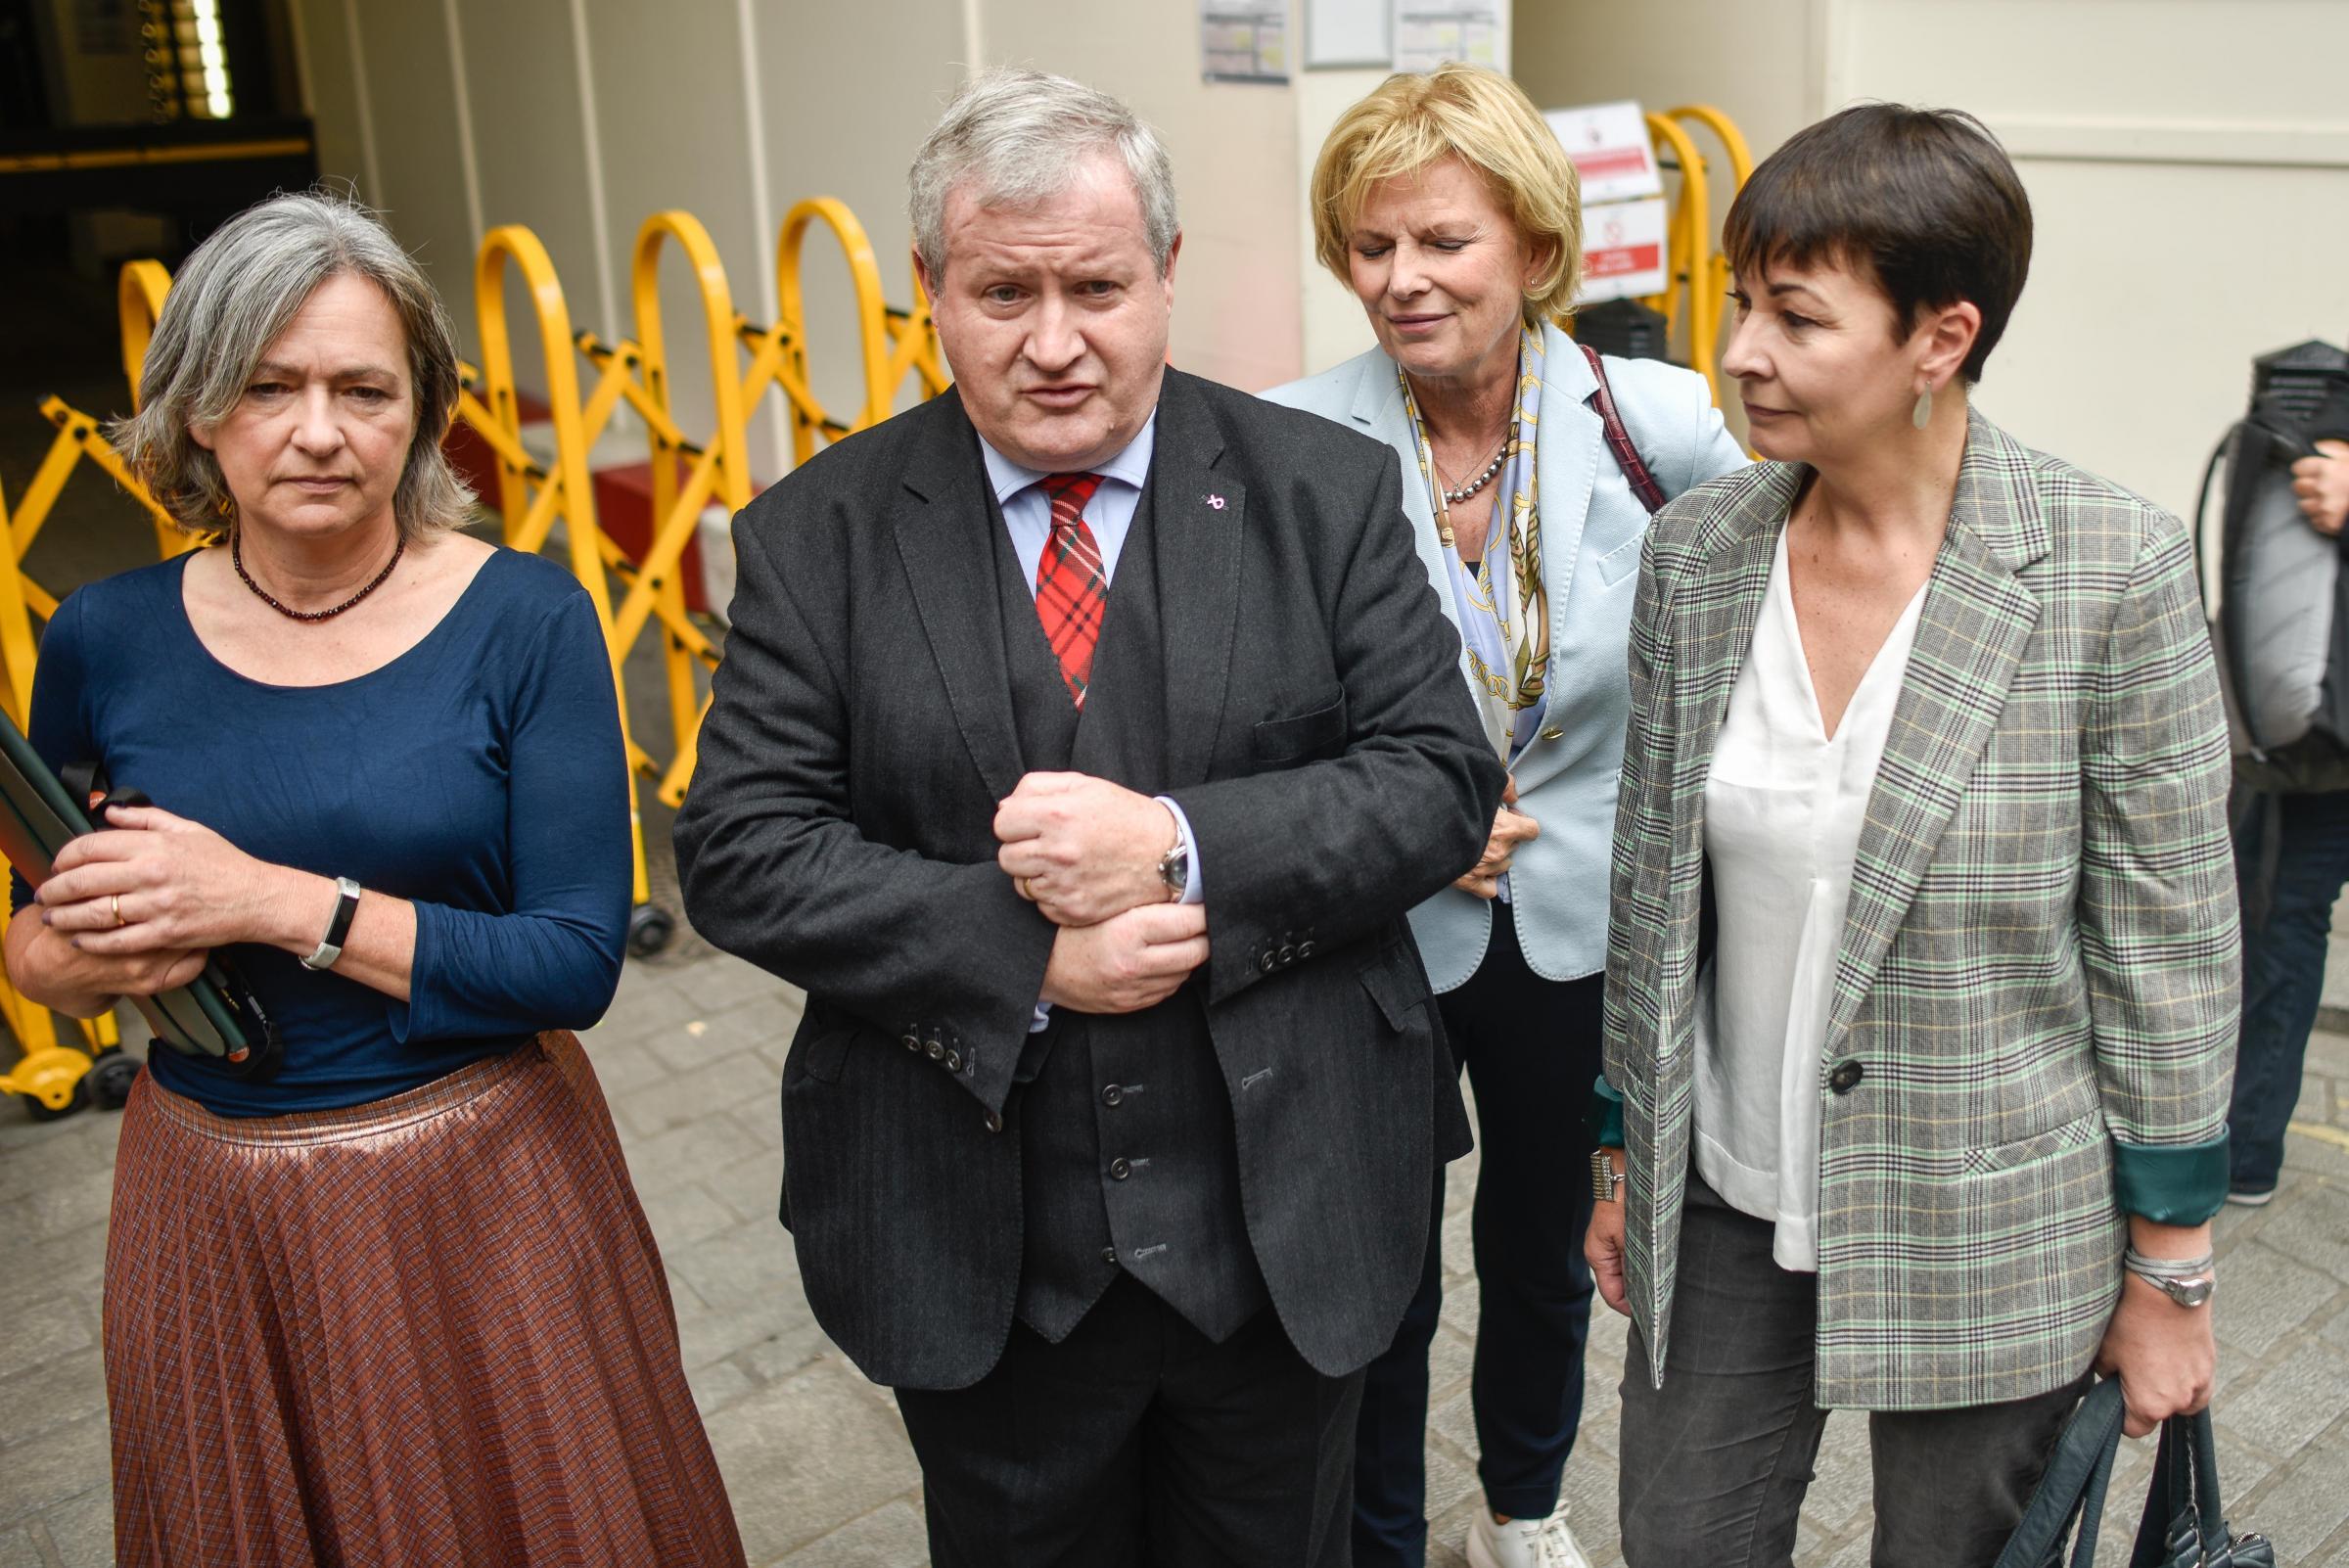 Ian Blackford: Opposition's 'responsibility' to oust Boris Johnson